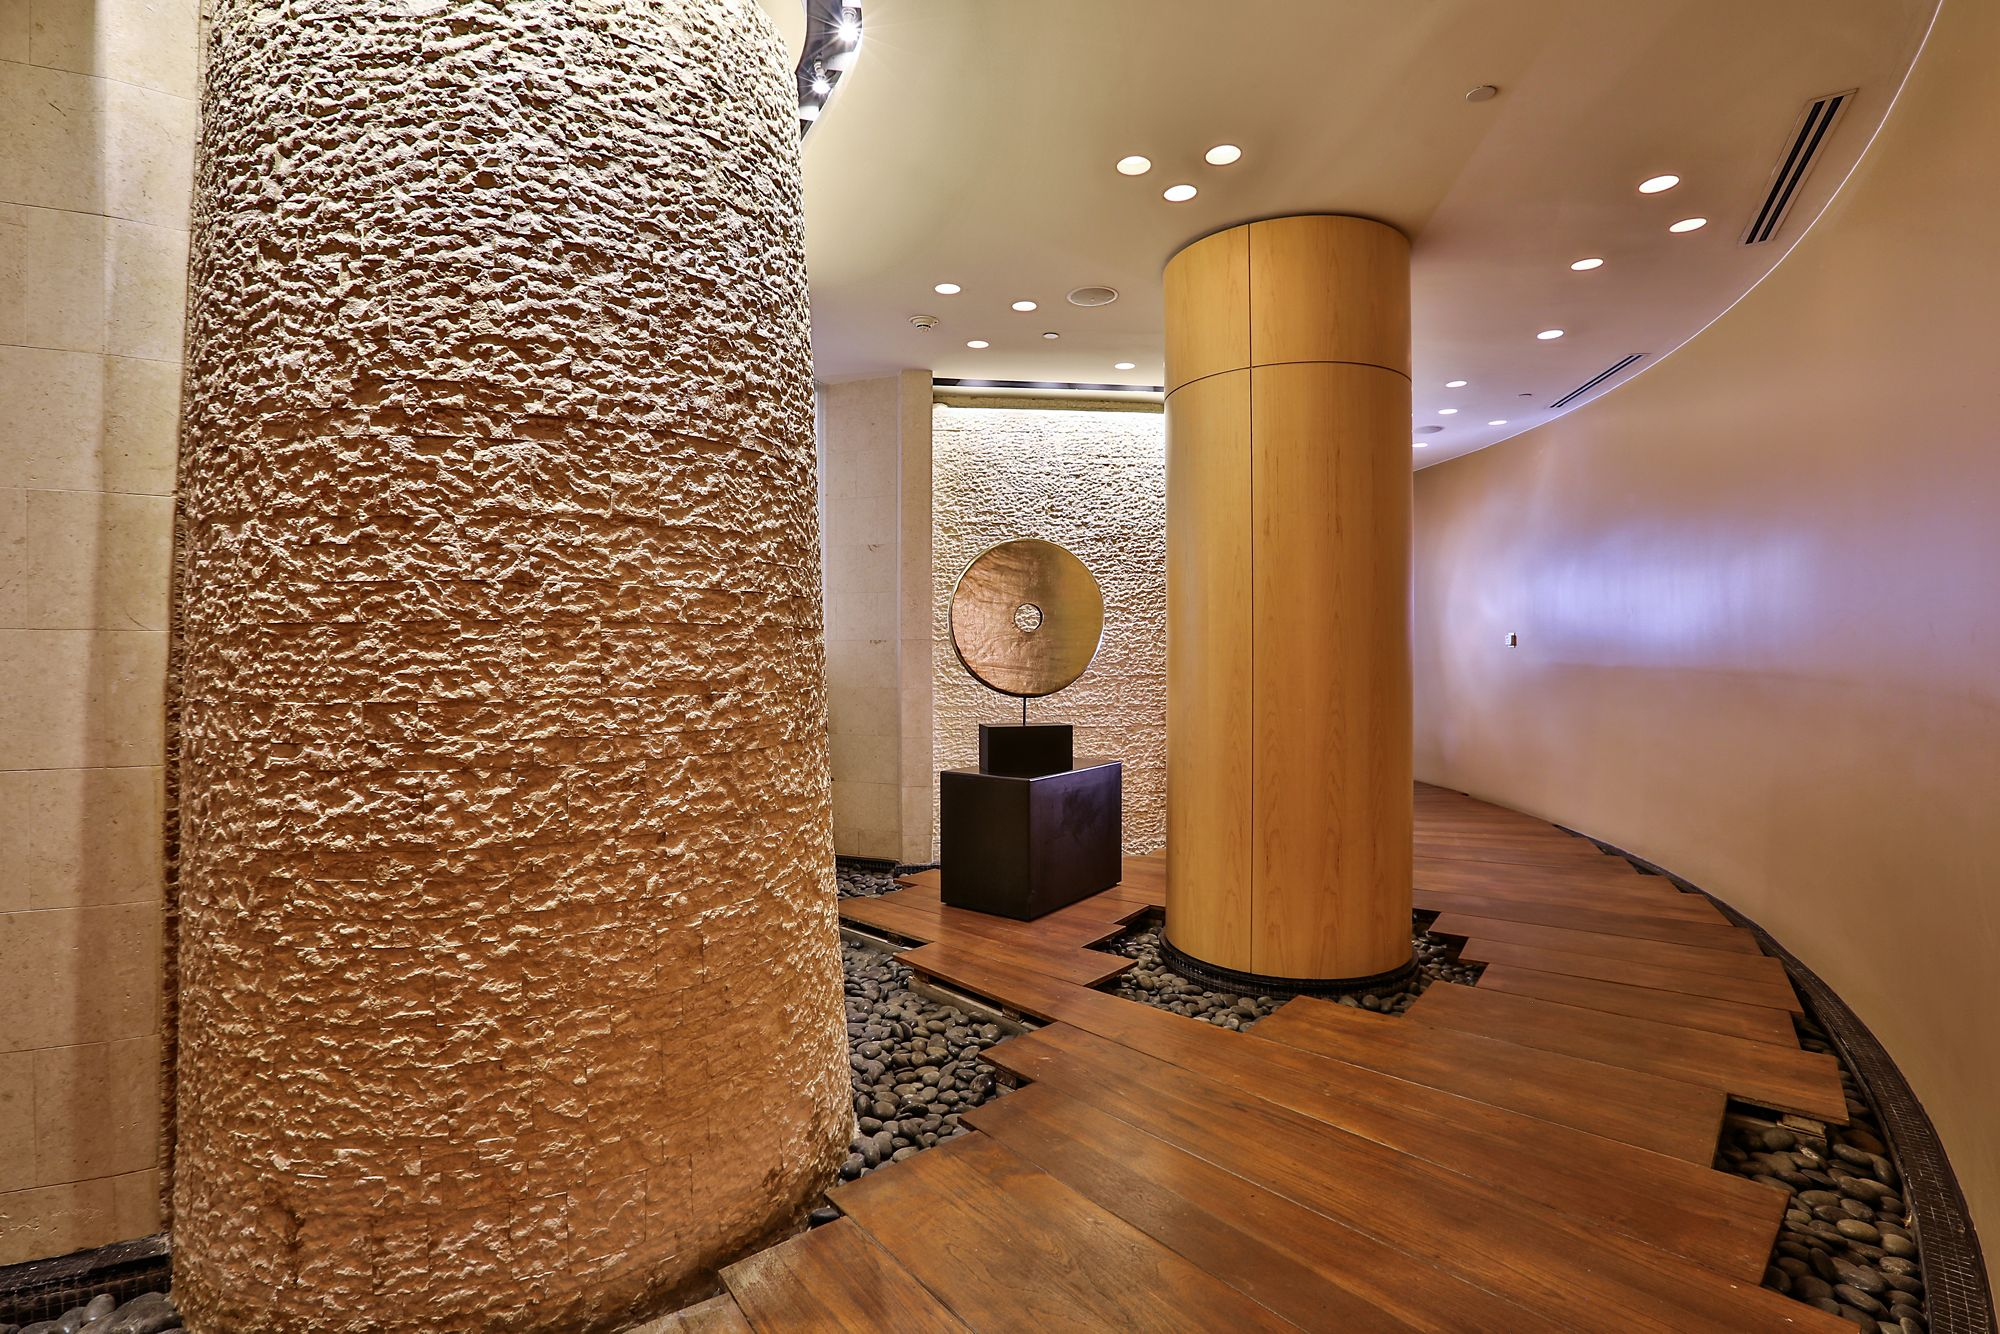 Miami Spa and Resort | The Ritz-Carlton Bal Harbour, Miami